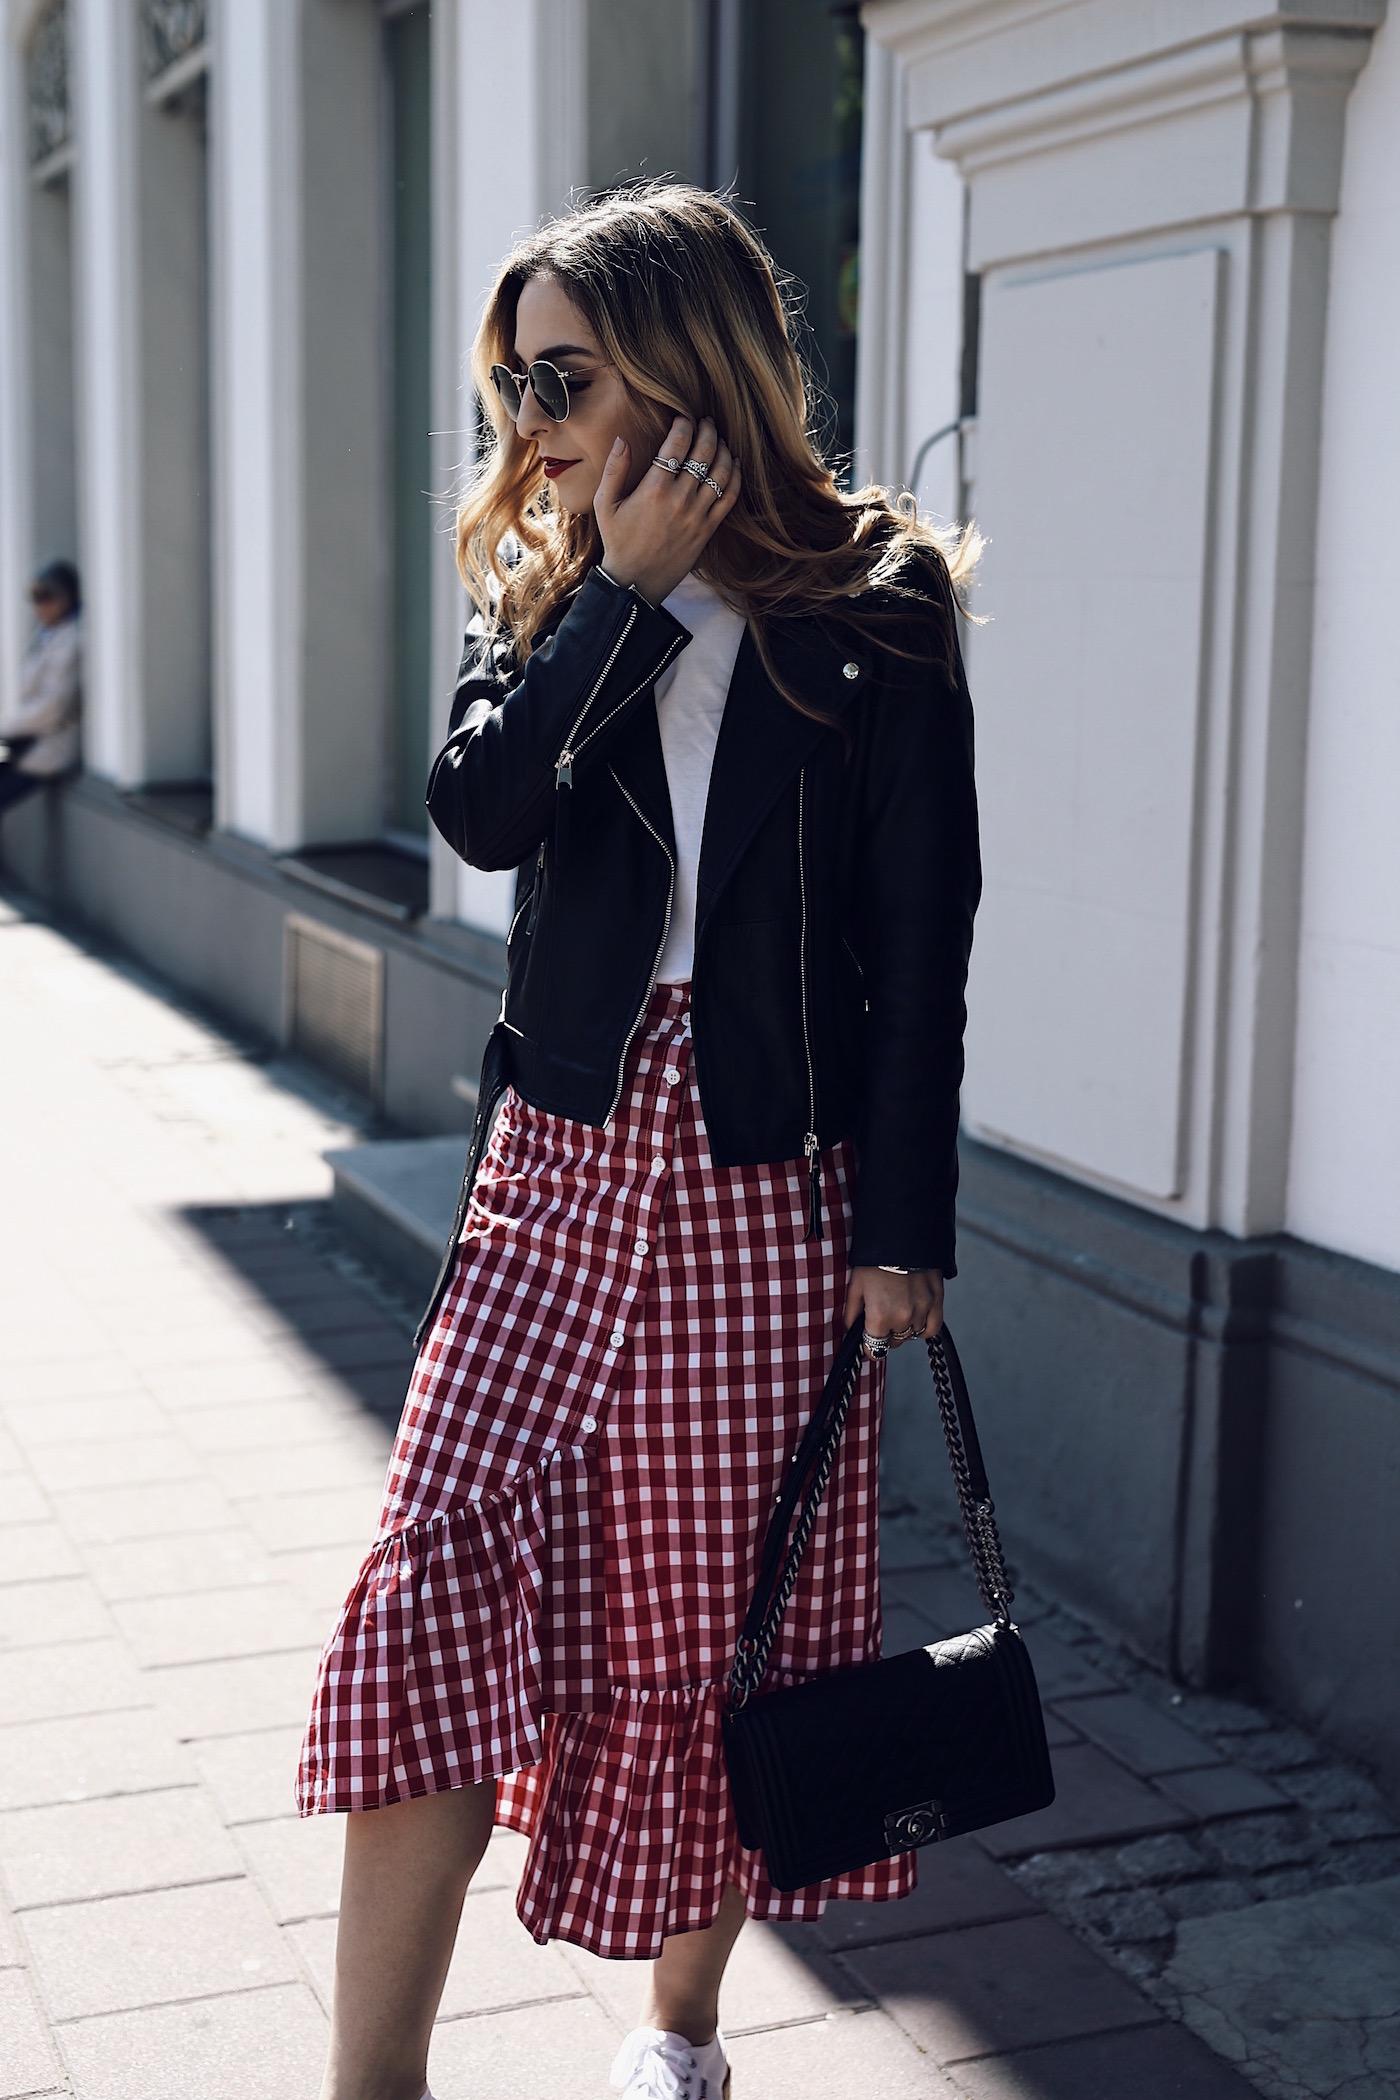 Summer Skirt Trends 2017 | Want Get Repeat Fashion Blog Nürnberg Deutschland